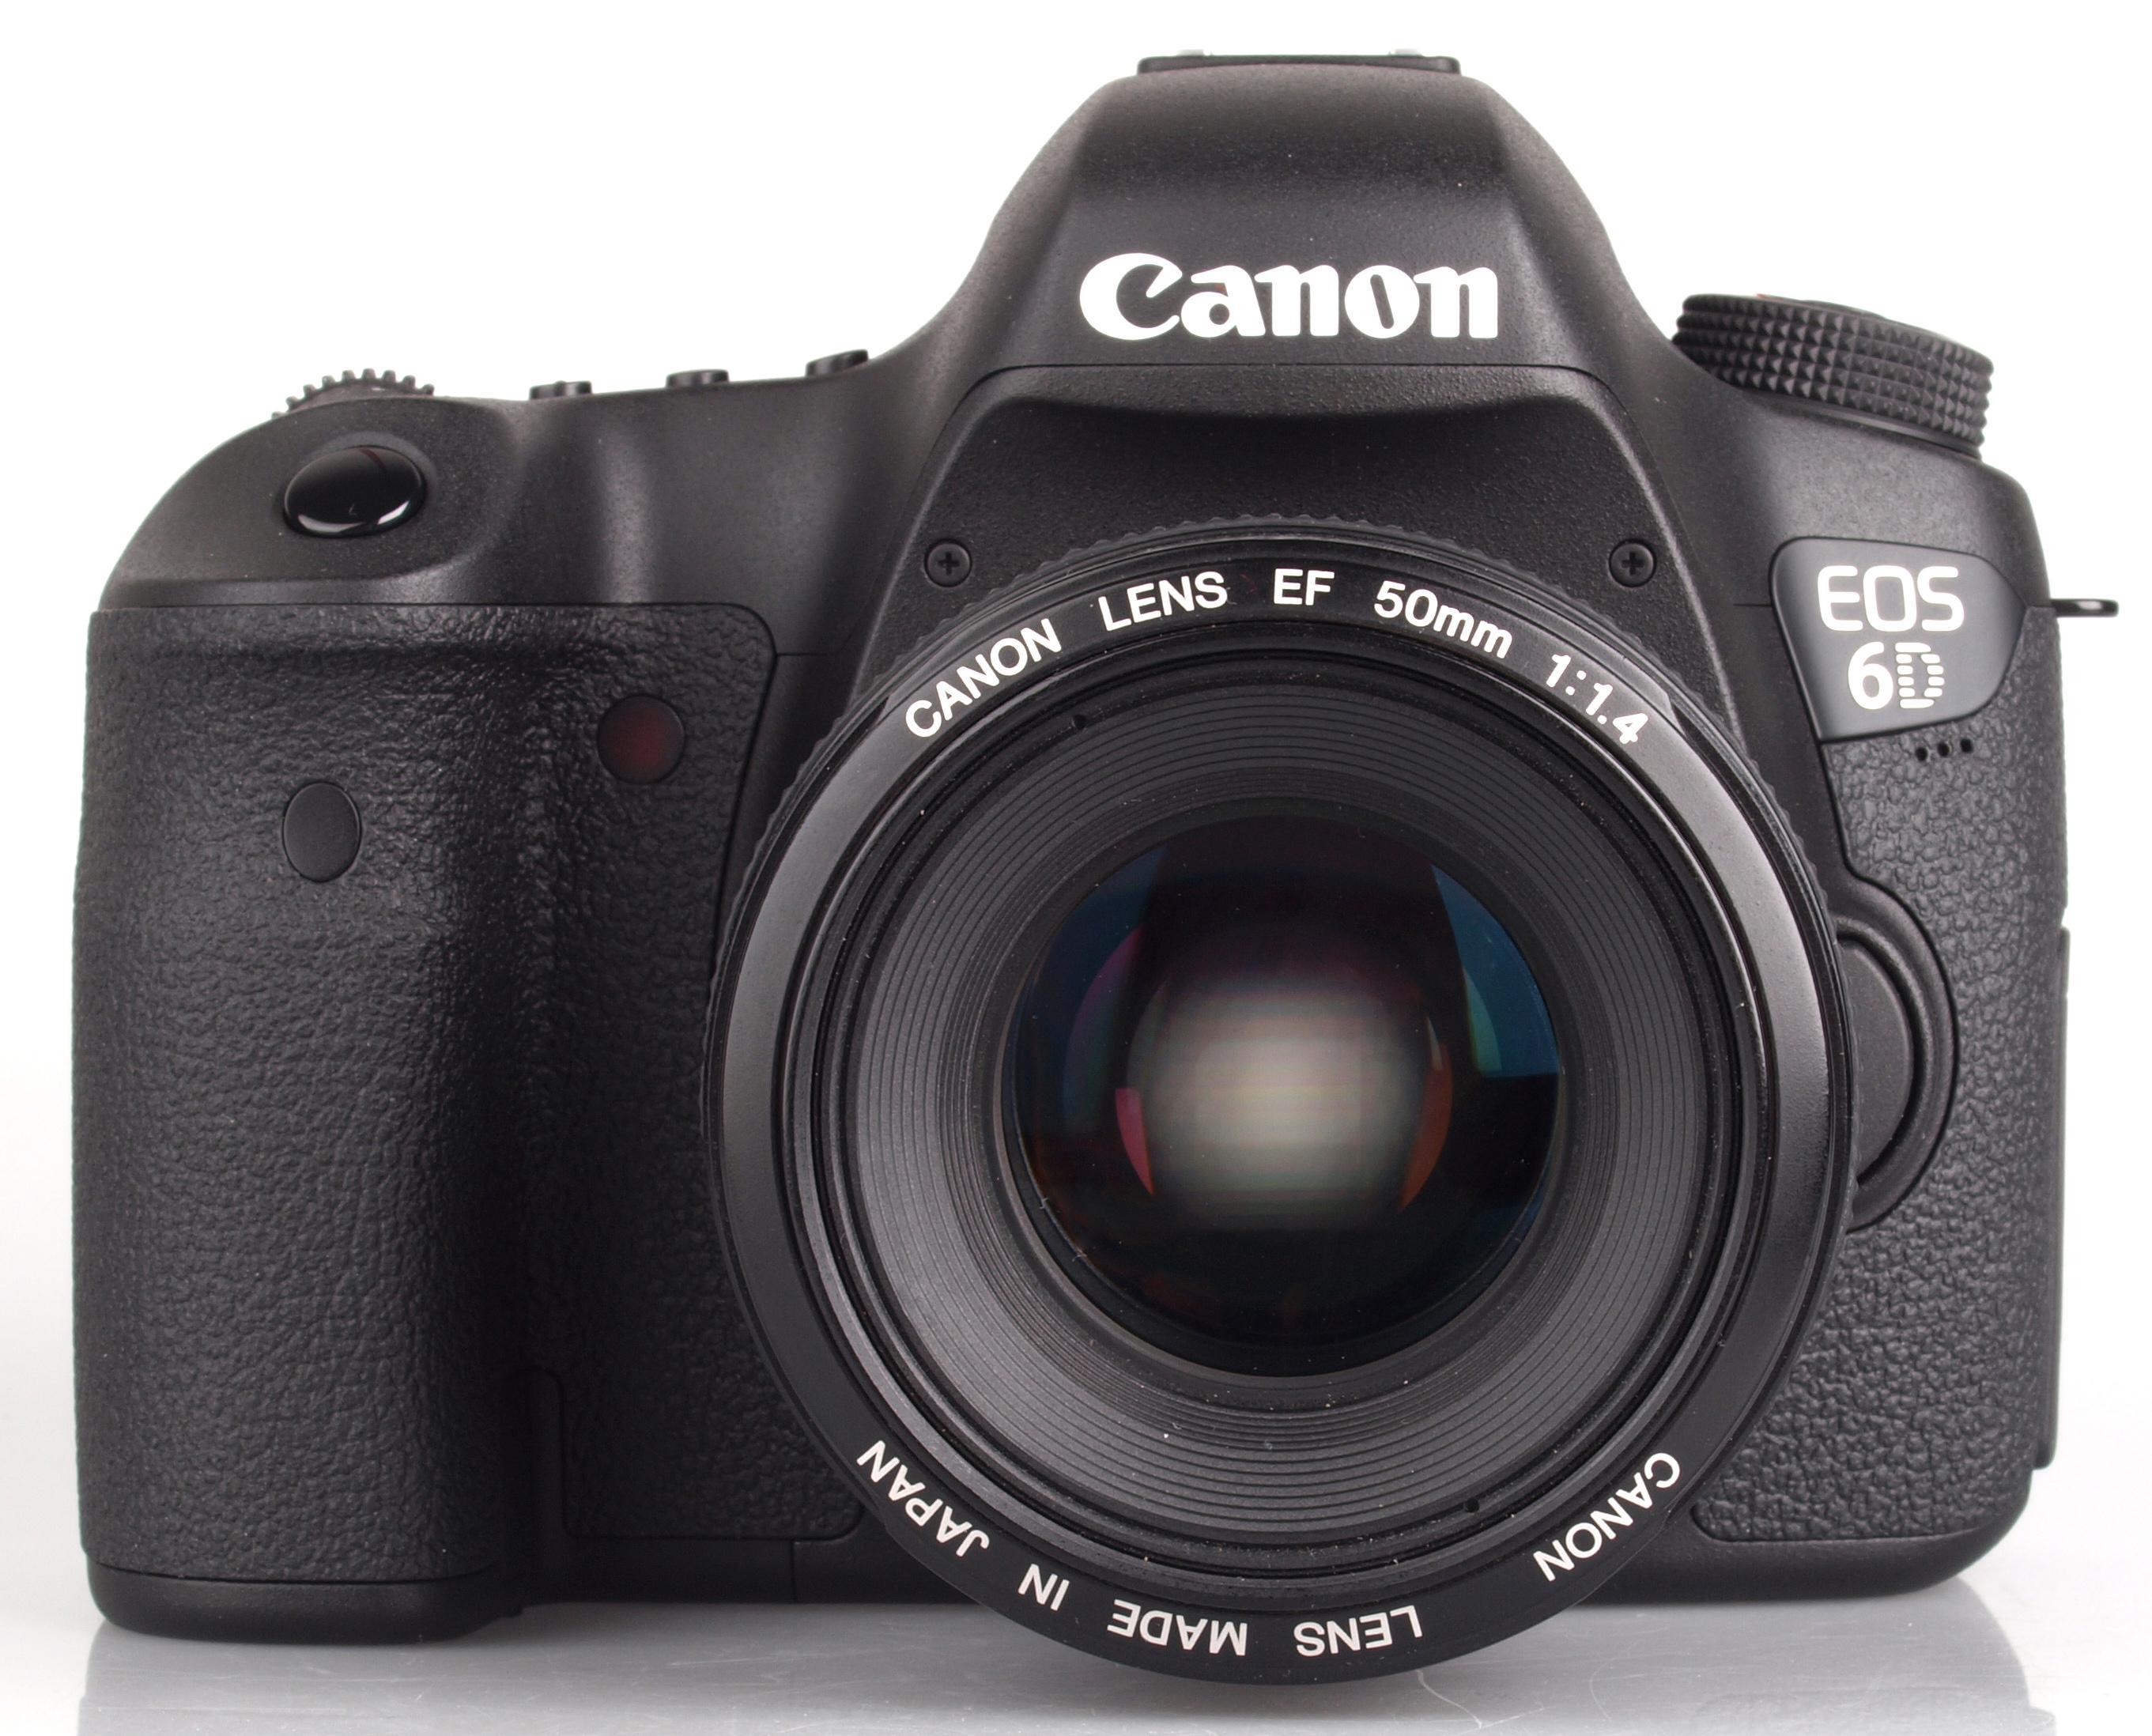 Camera Best Cameras 2014 Dslr top 10 best digital slrs 2014 canon eos 6d front new